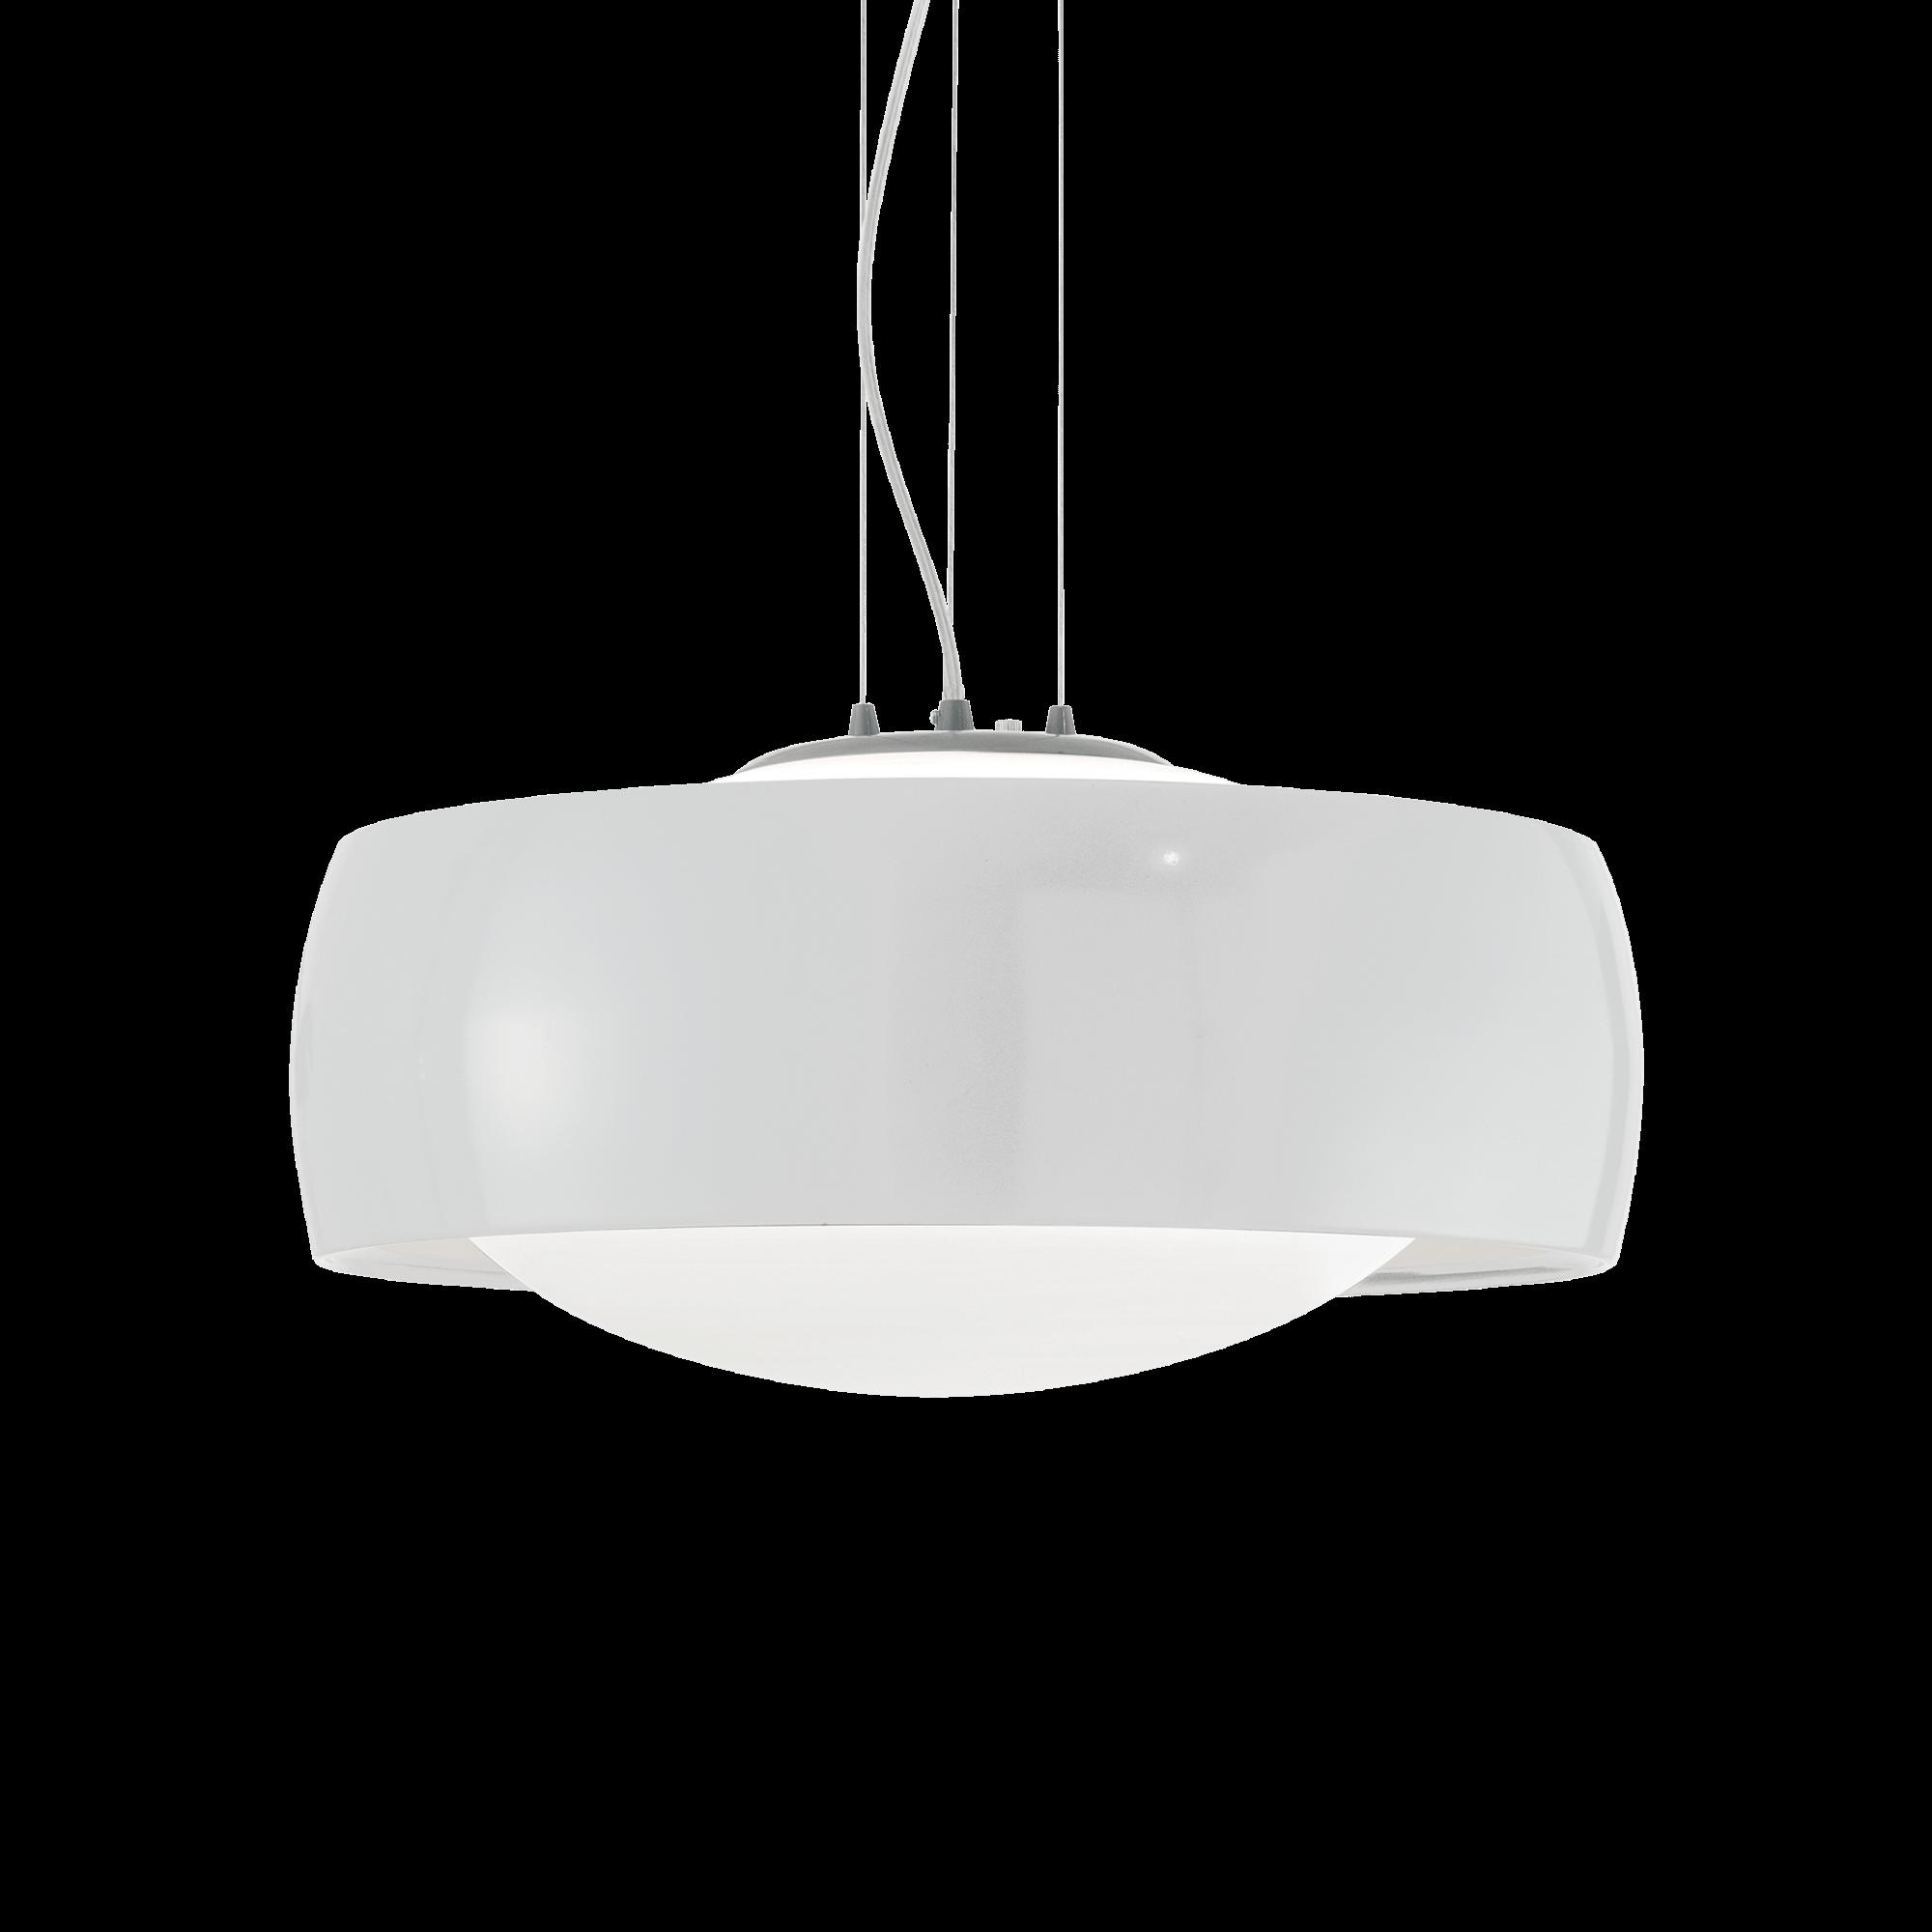 Ideal Lux 159553 COMFORT SP1 BIANCO lámpa függeszték